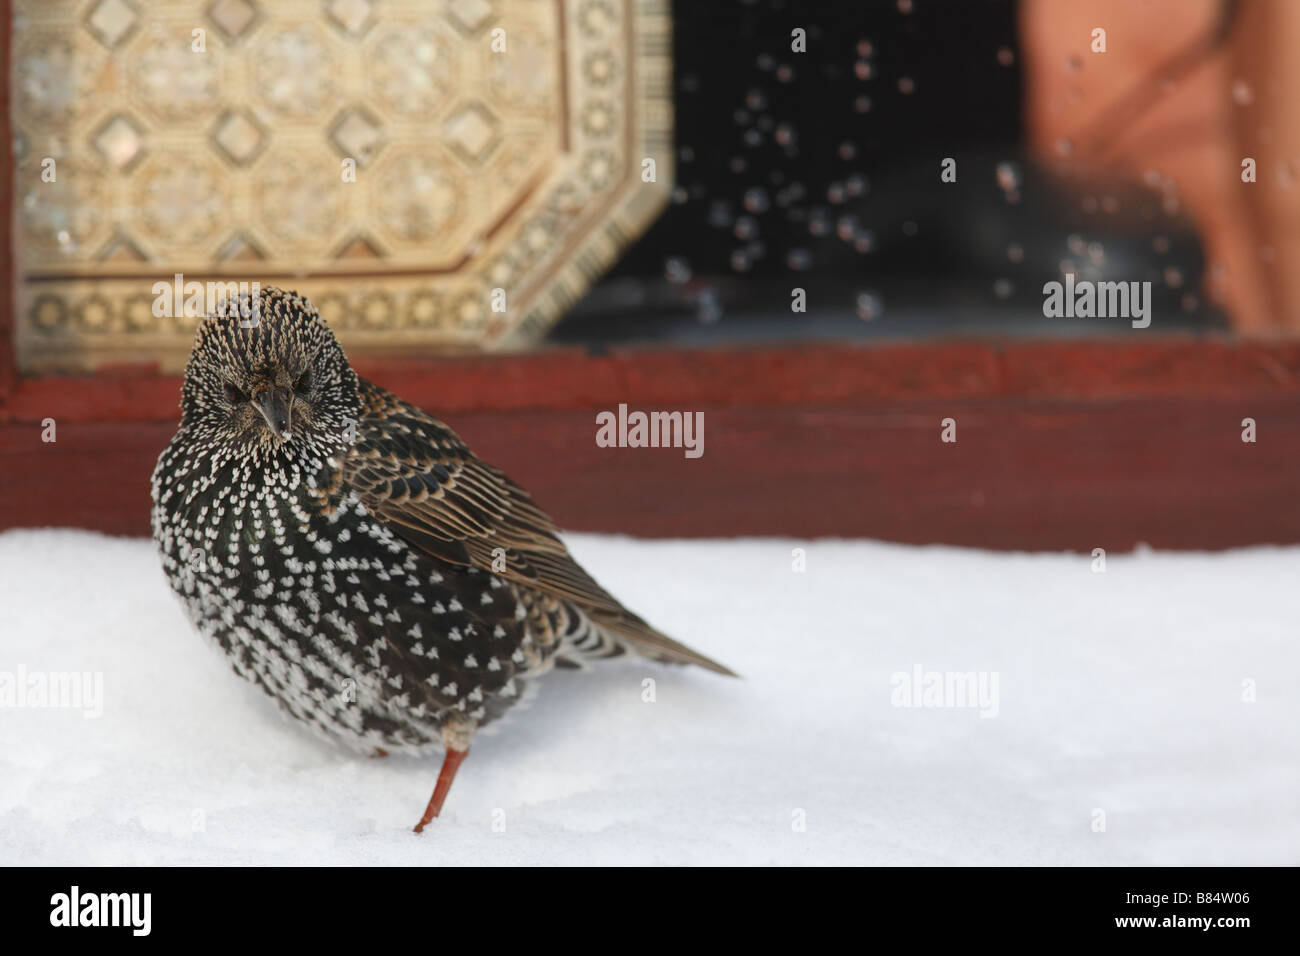 STARLING Sternus vulgaris PERCHING ON SNOW COVERED WINDOWSILL - Stock Image